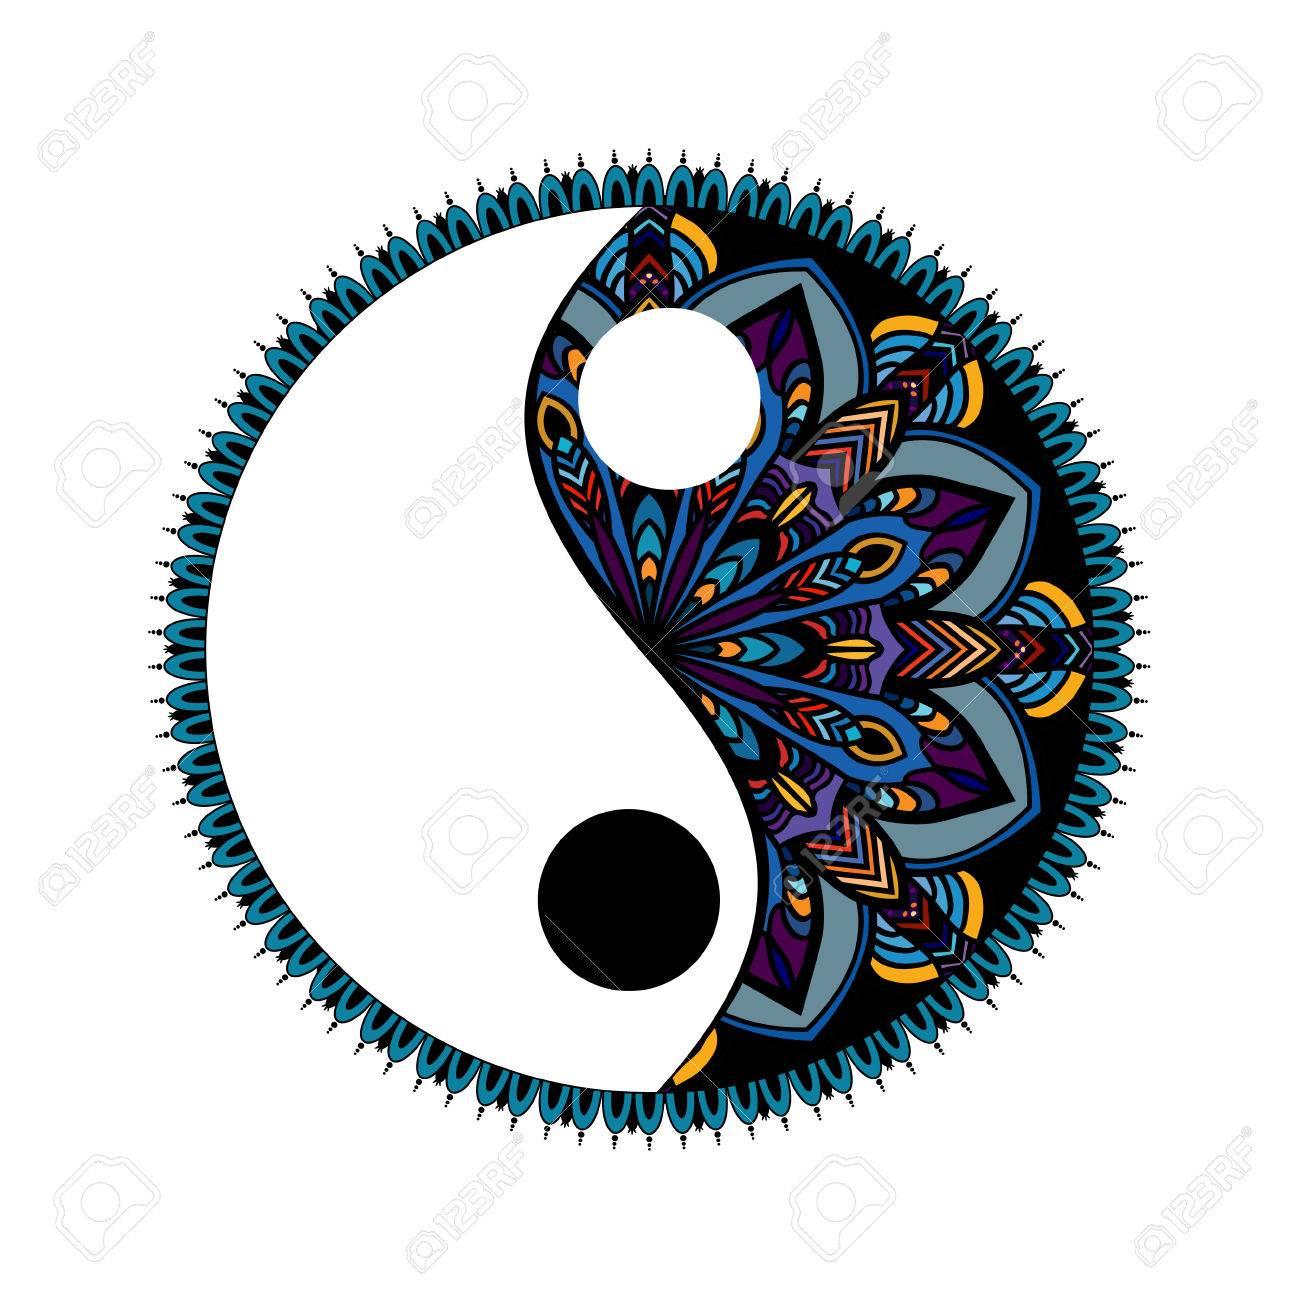 multicolored Yin yang decorative symbol. Hand drawn vintage style design element. mandala ornament doodles in zen tangle style - 76868573